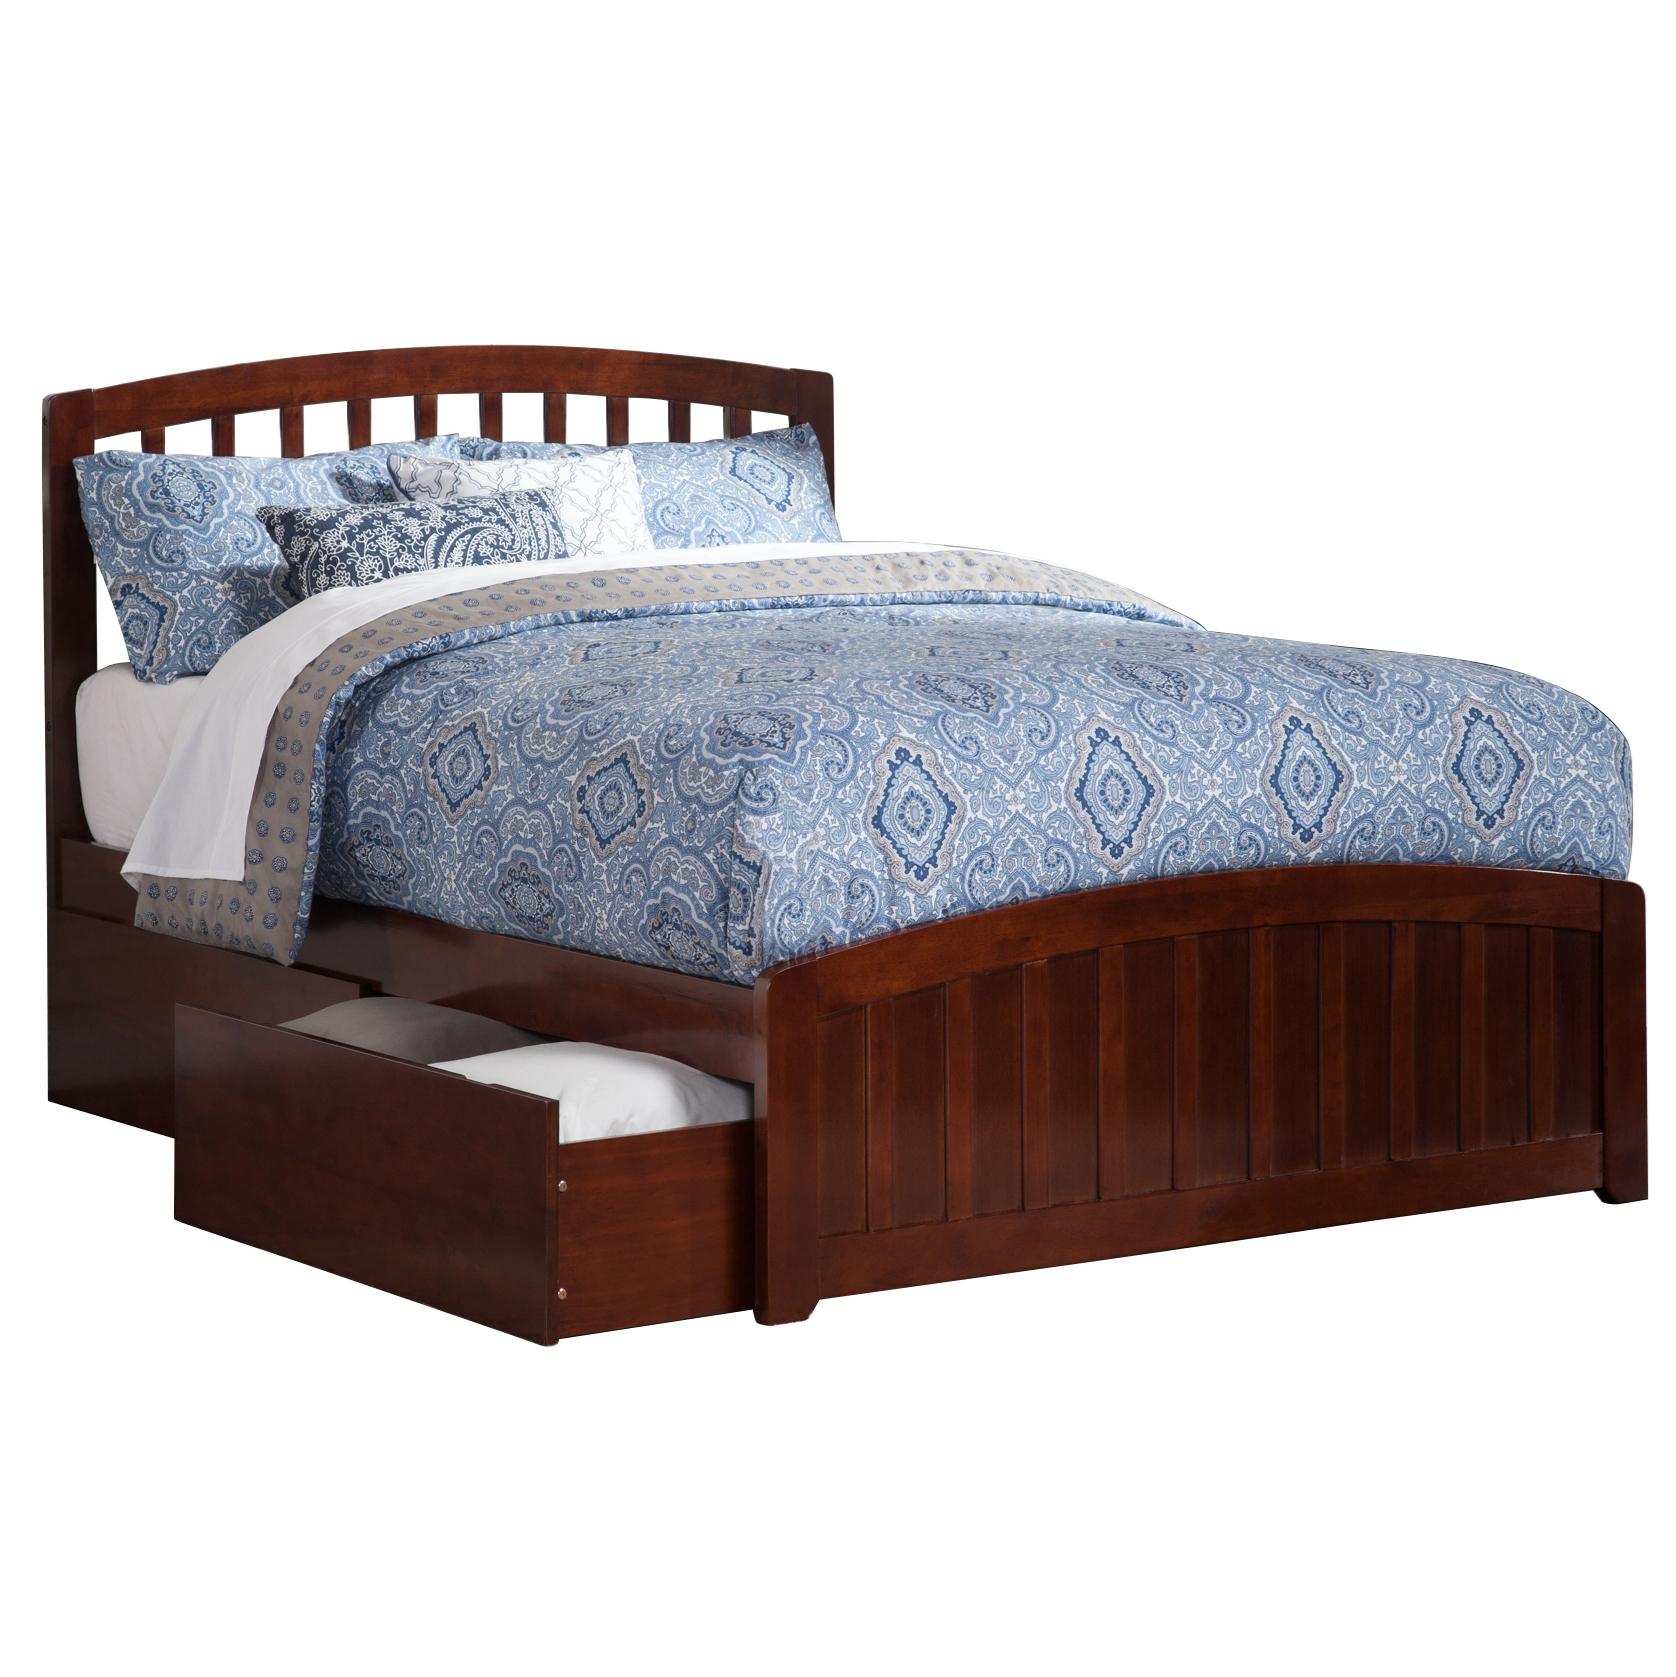 Richmond Platform Bed with Matching Footboard - Antique Walnut